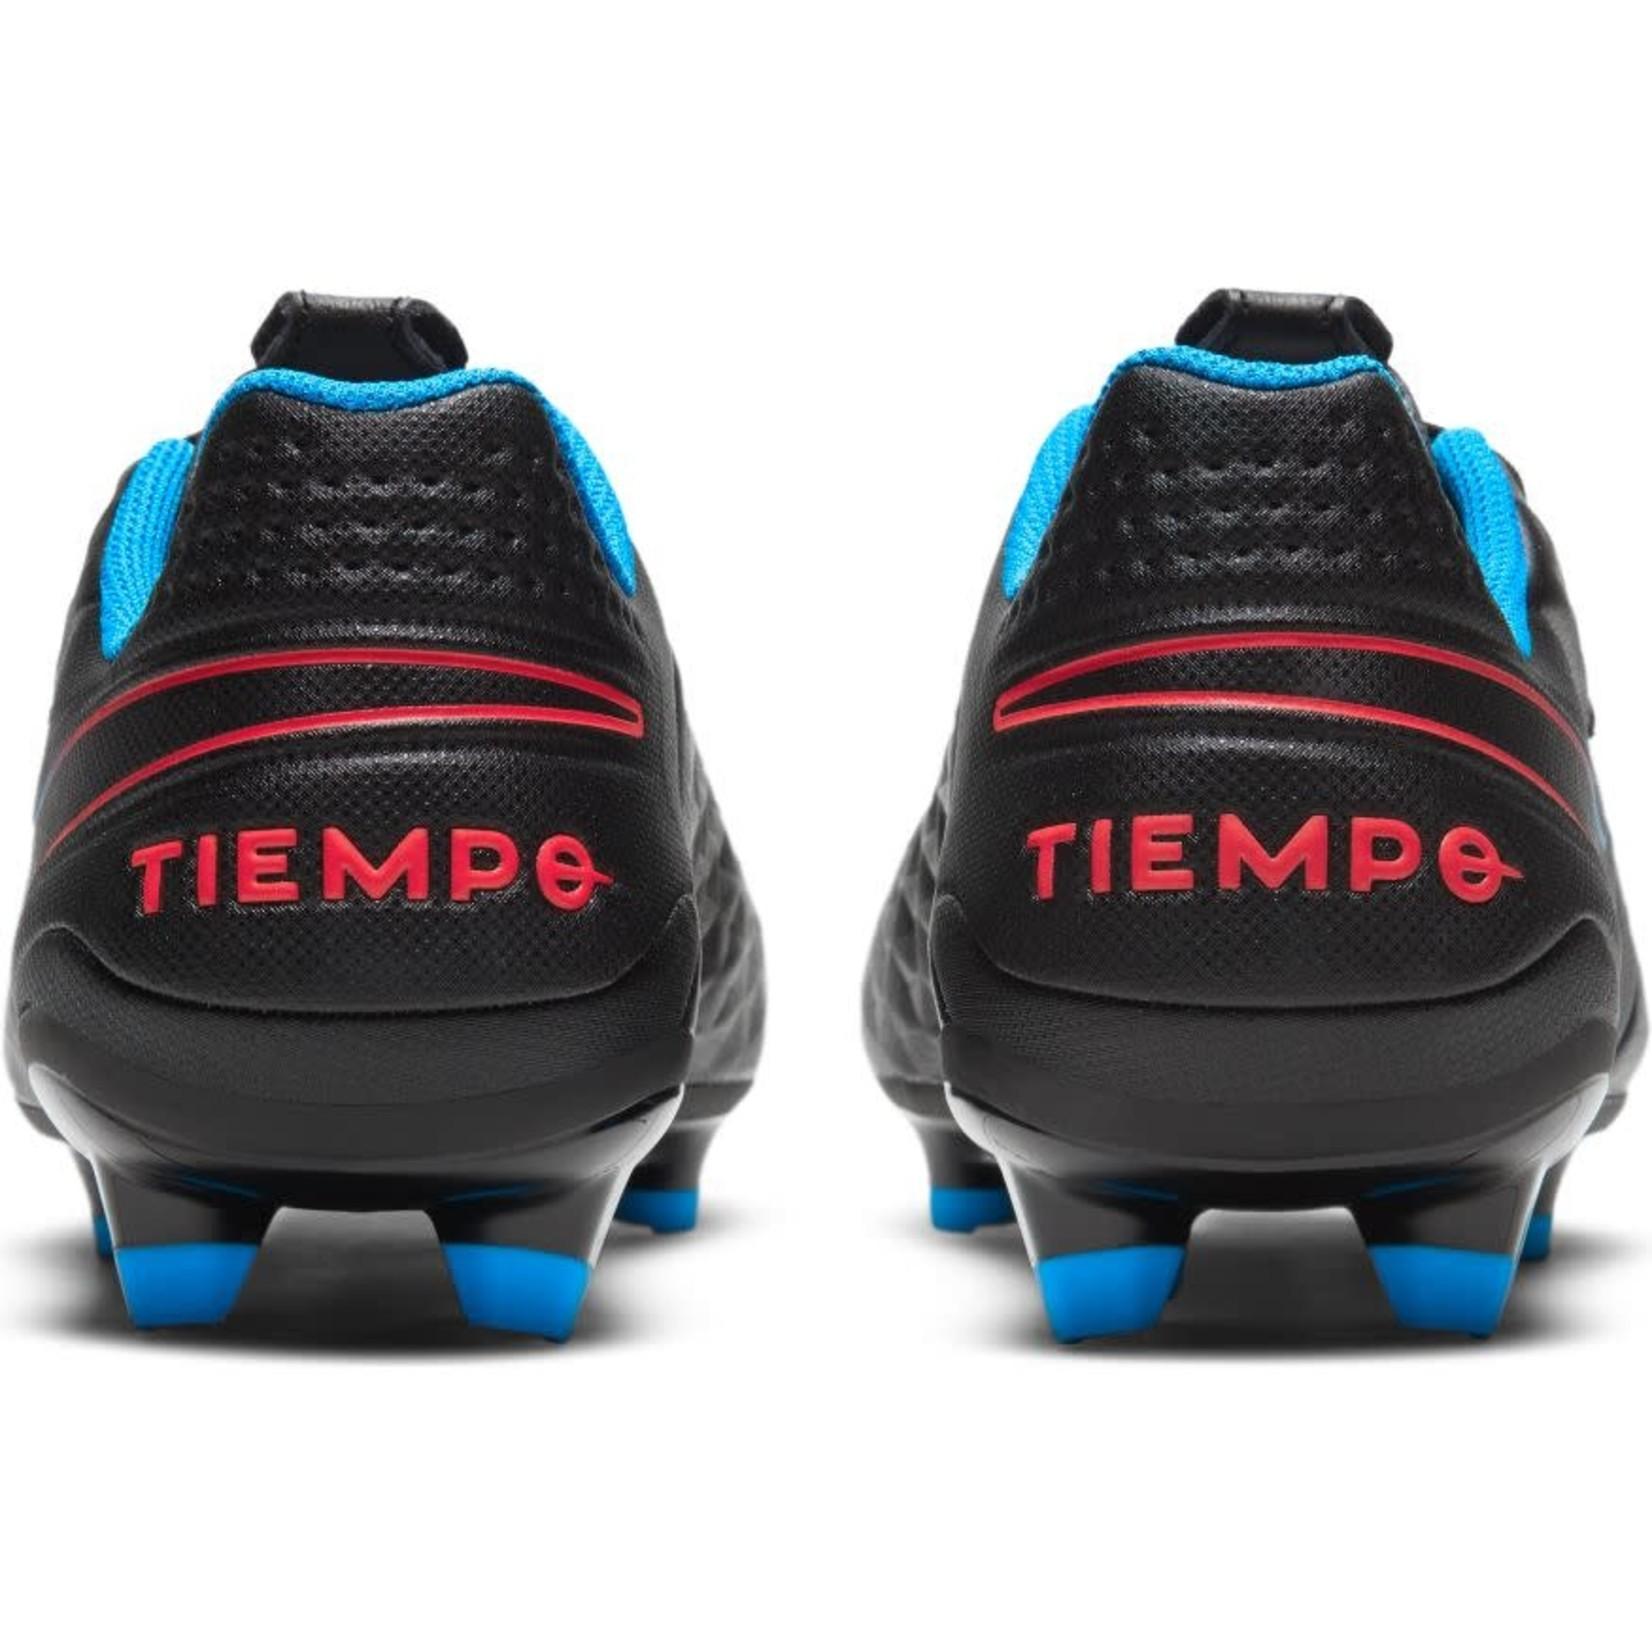 NIKE TIEMPO LEGEND 8 ACADEMY FG/MG (BLACK/BLUE/RED)